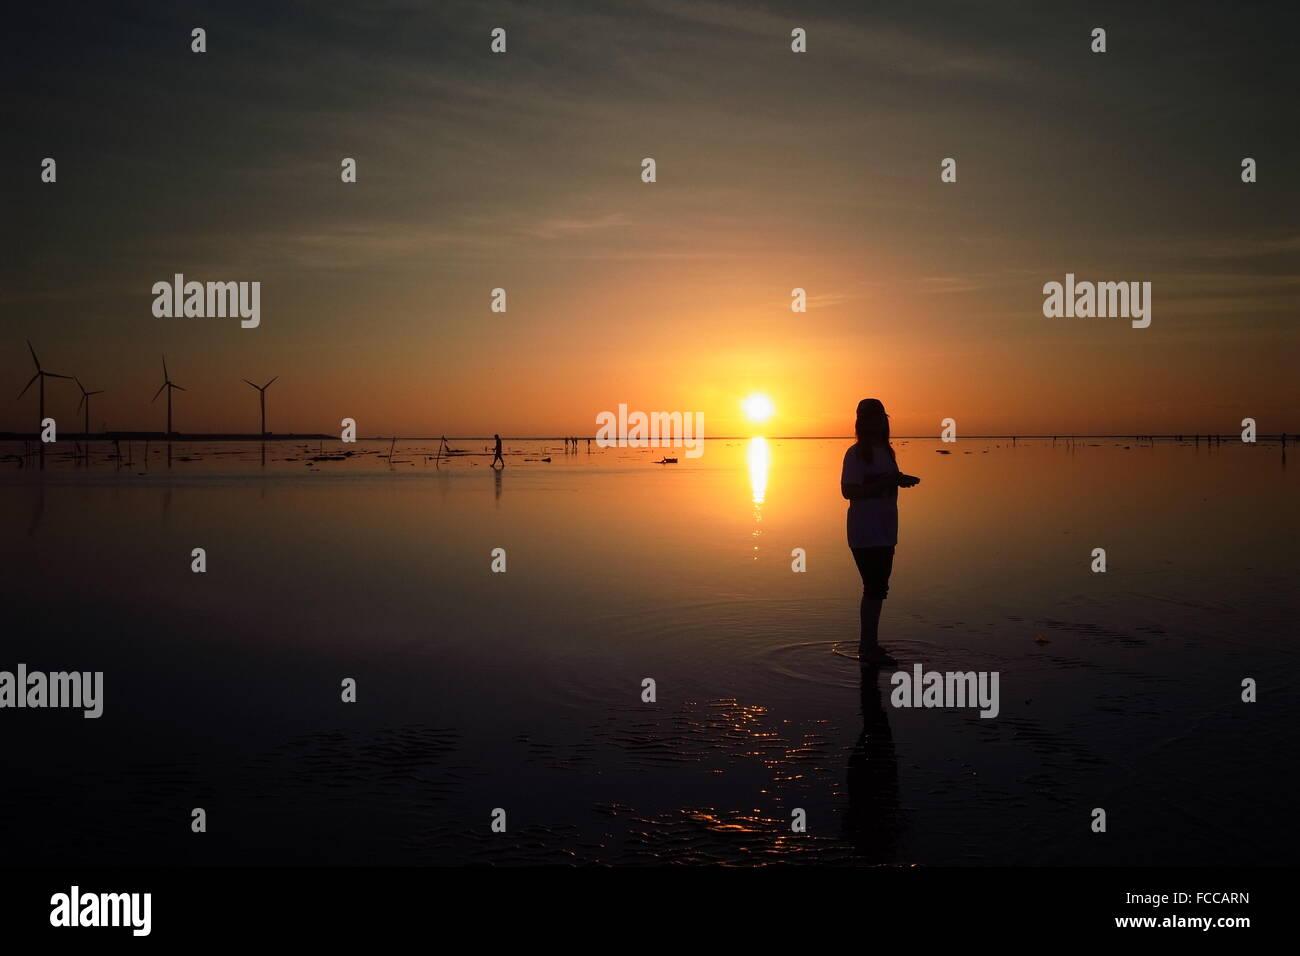 Silhouette Frau stehen am Strand bei Sonnenuntergang Stockbild